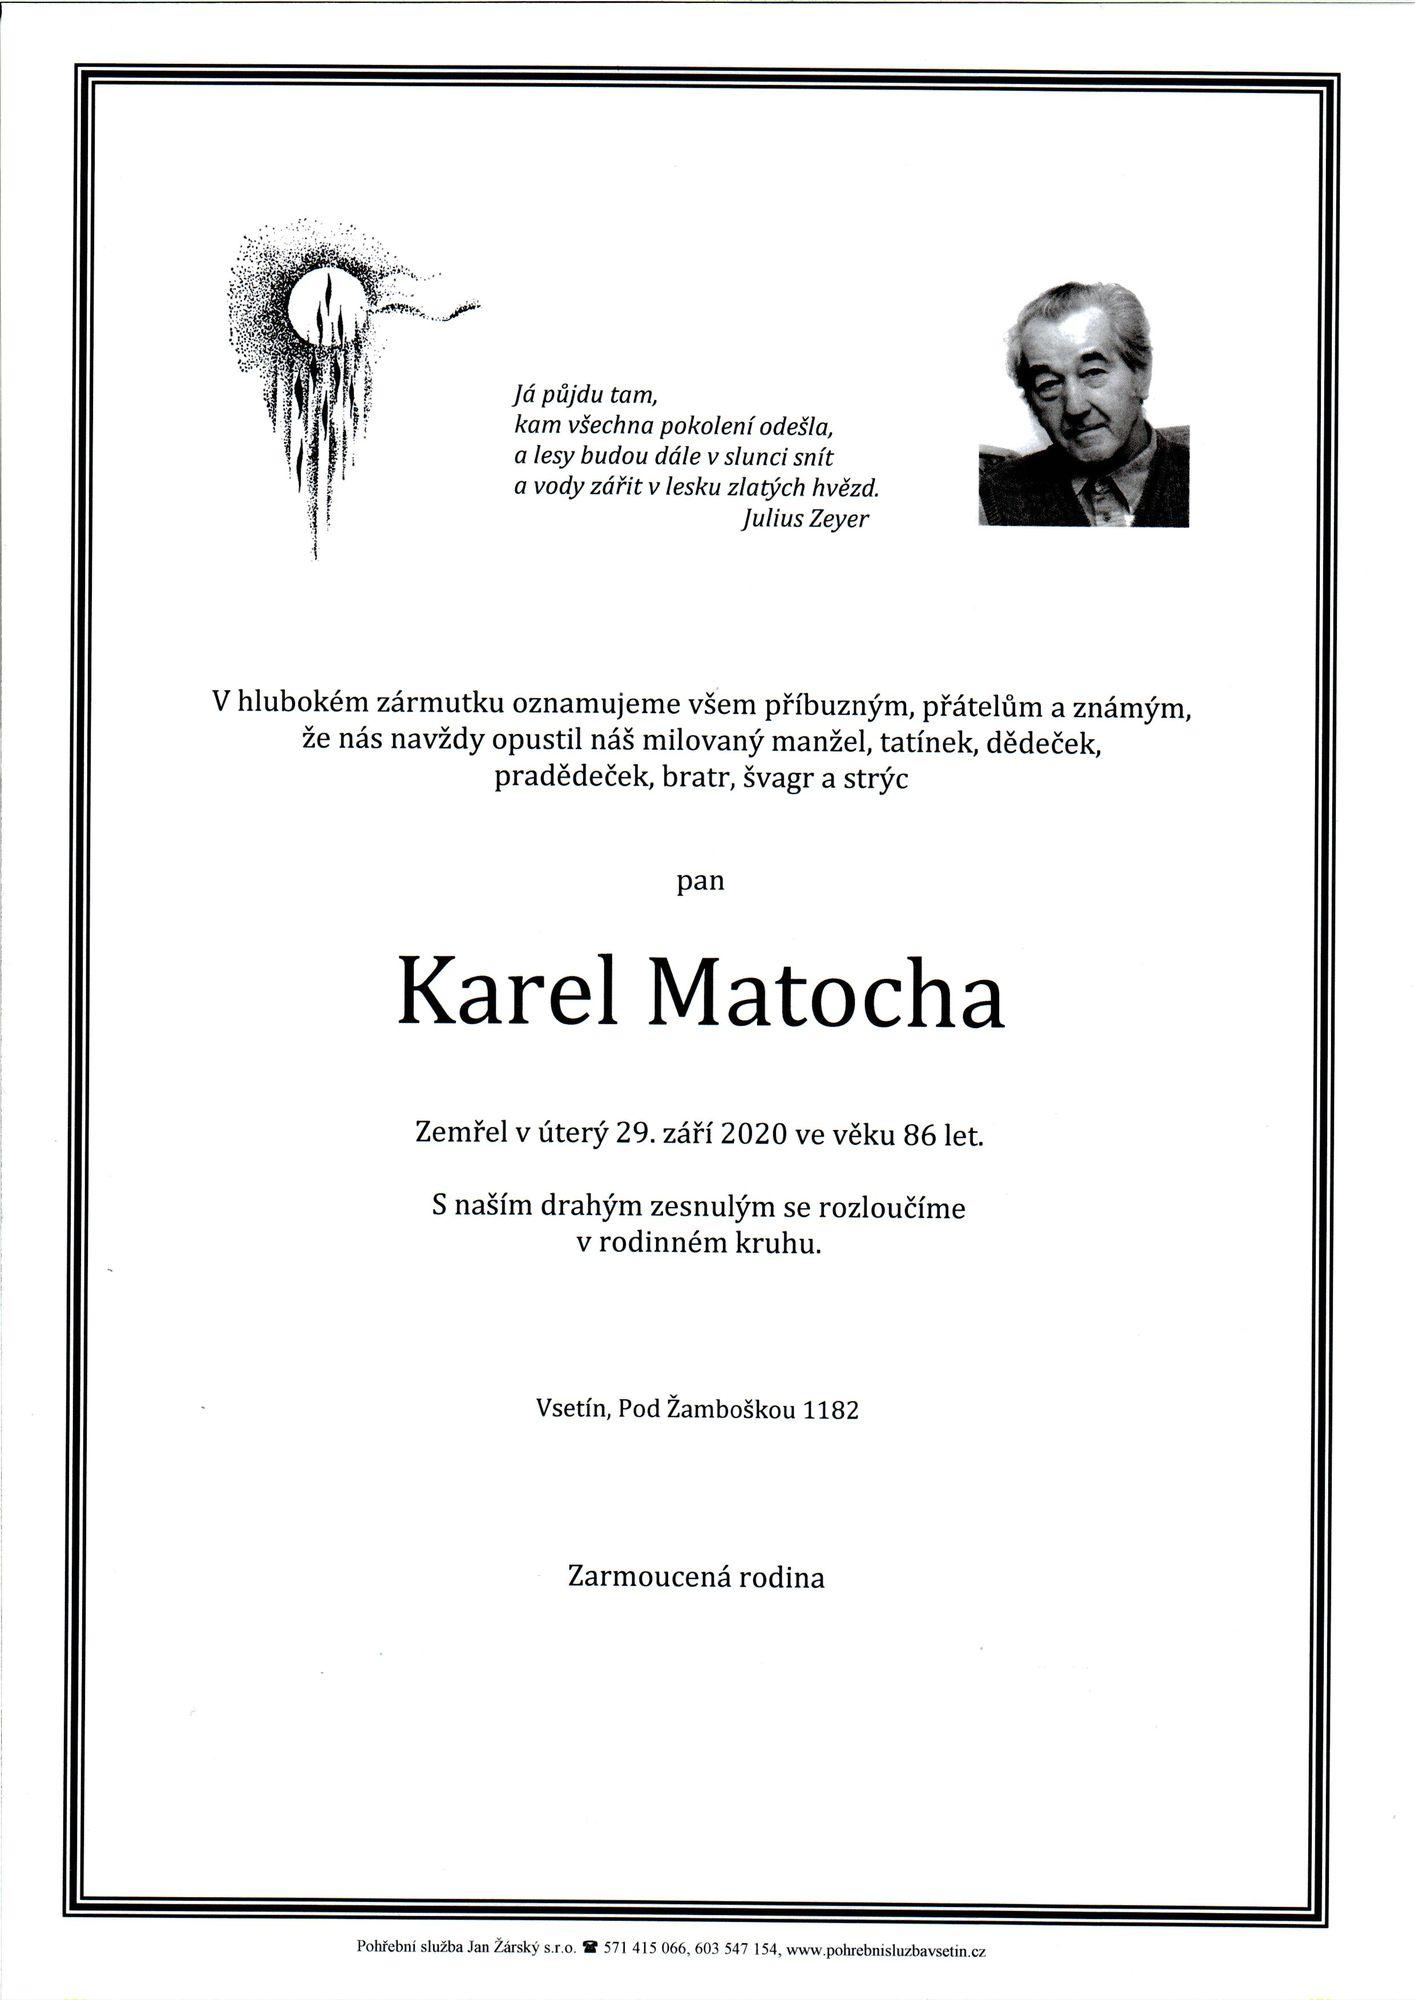 Karel Matocha